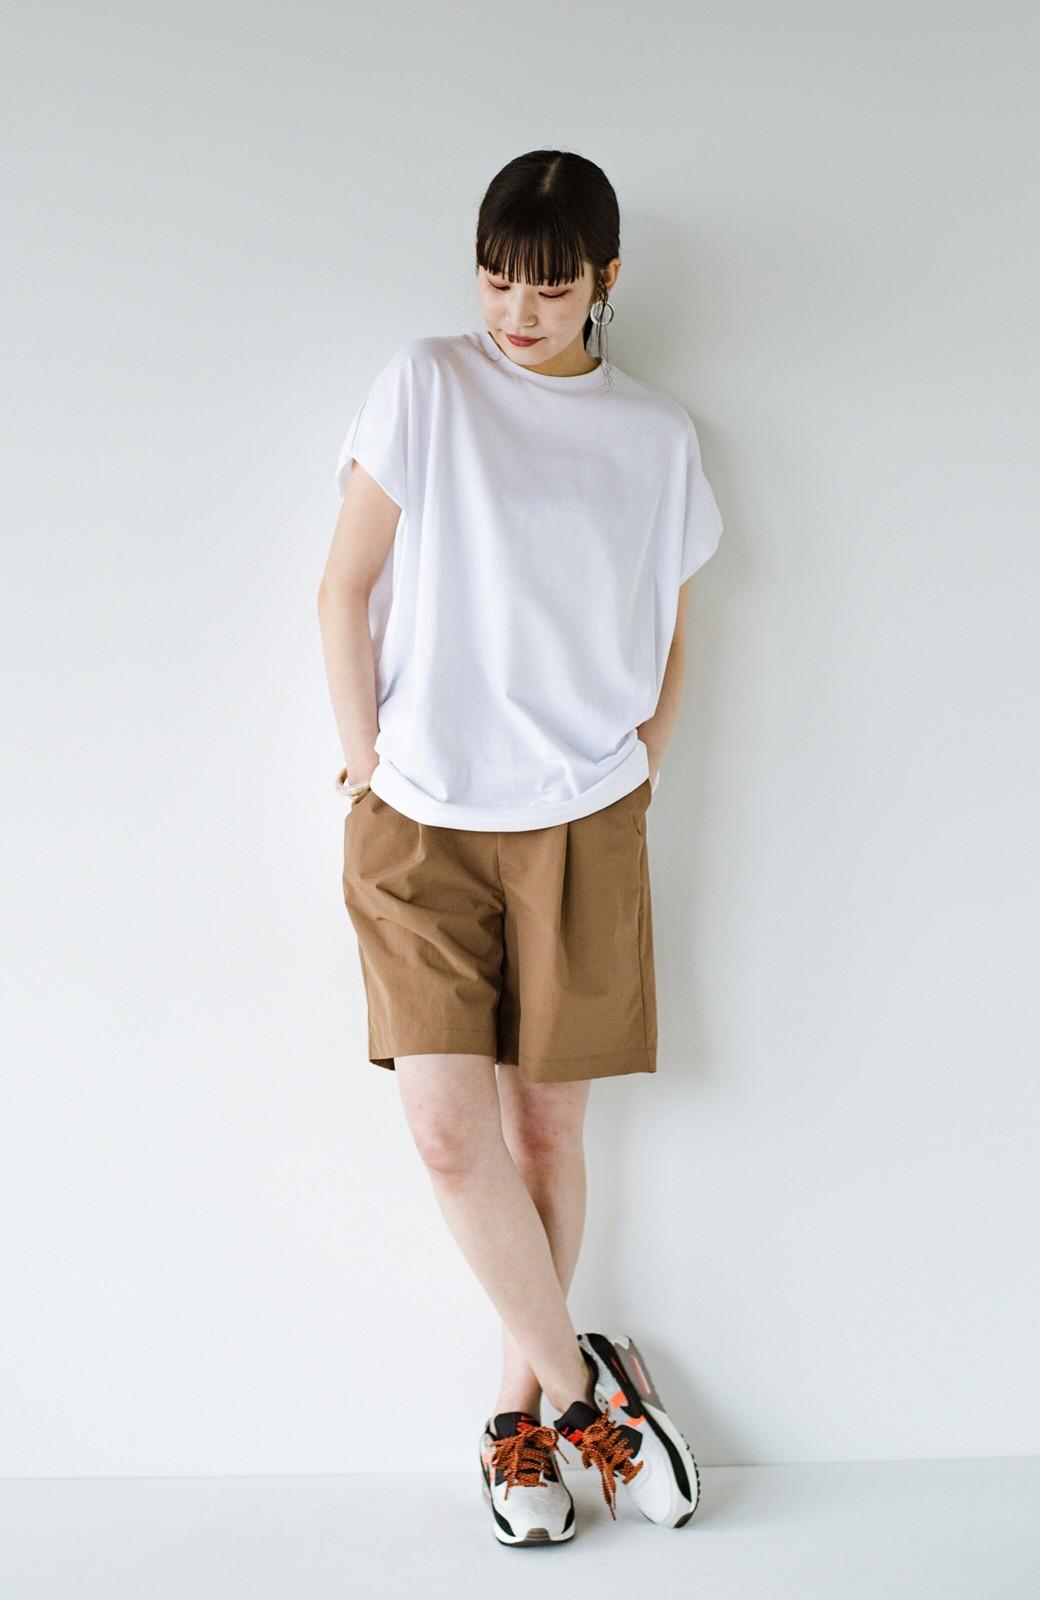 haco! PBPオーガニックコットン 楽ちんなのにブラウス気分で着られる大人のおめかしTシャツ <ホワイト>の商品写真14